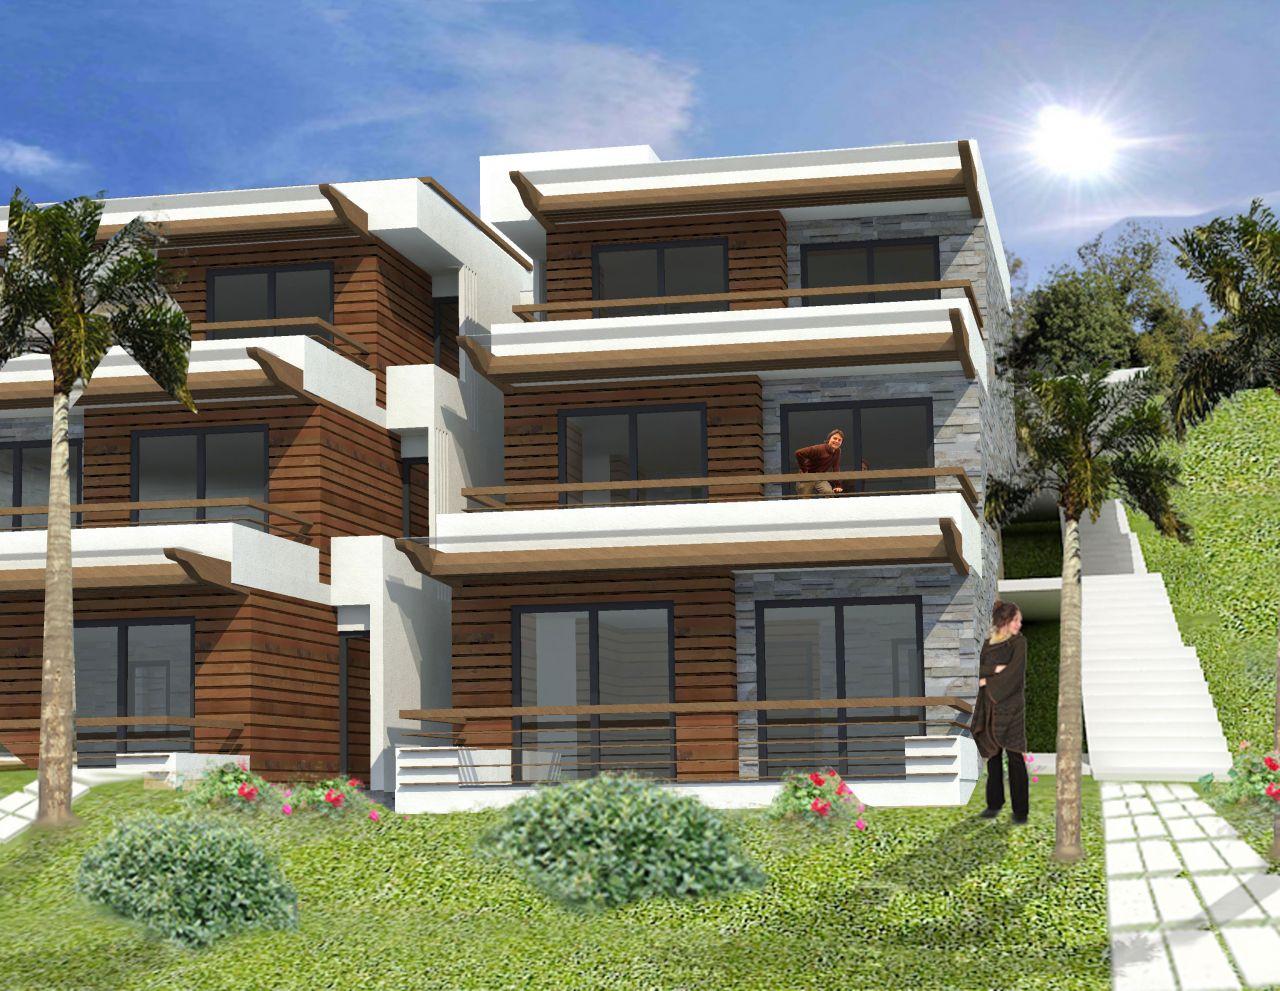 Apartment in the Albanian Riviera in  Vlora, Albania, for Sale